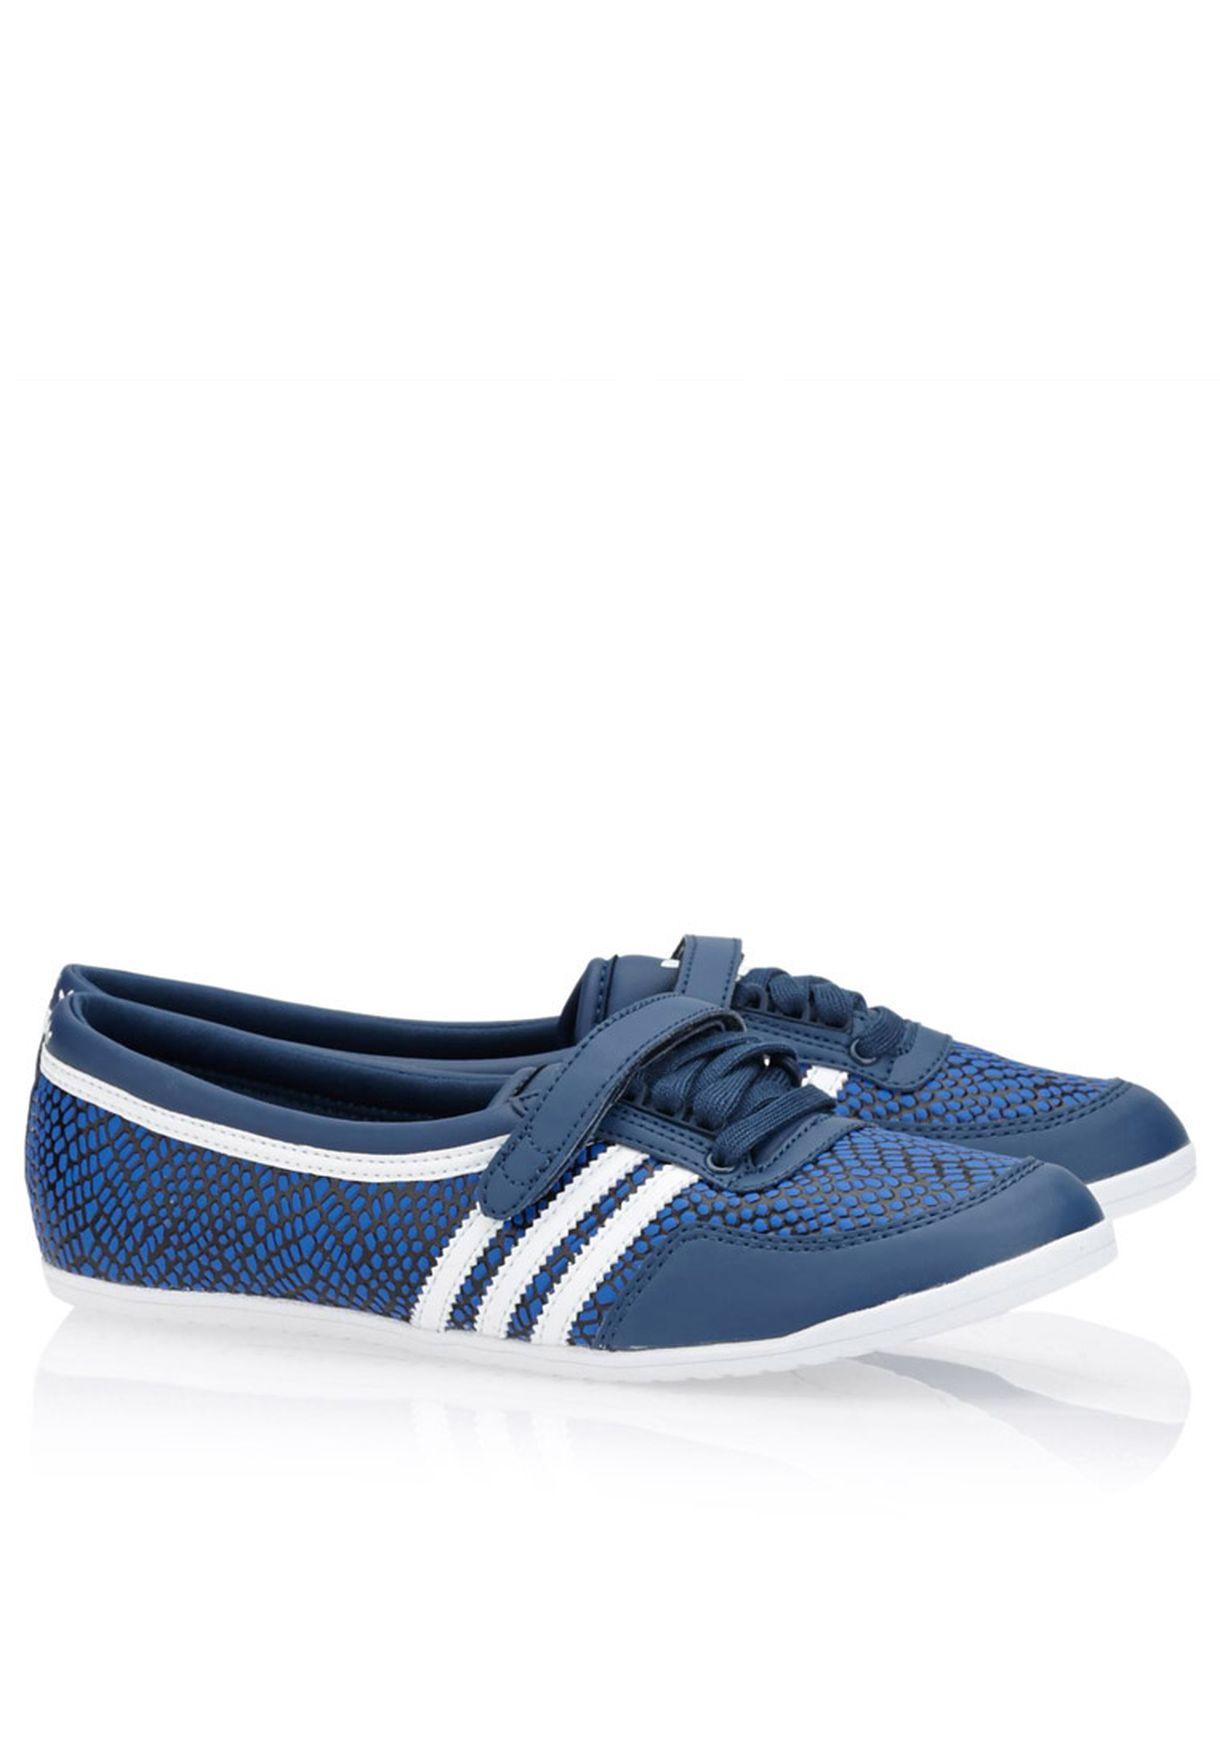 a76f949ac4af19 Shop adidas Originals blue Concord Round W Slip Ons M20858 for Women ...